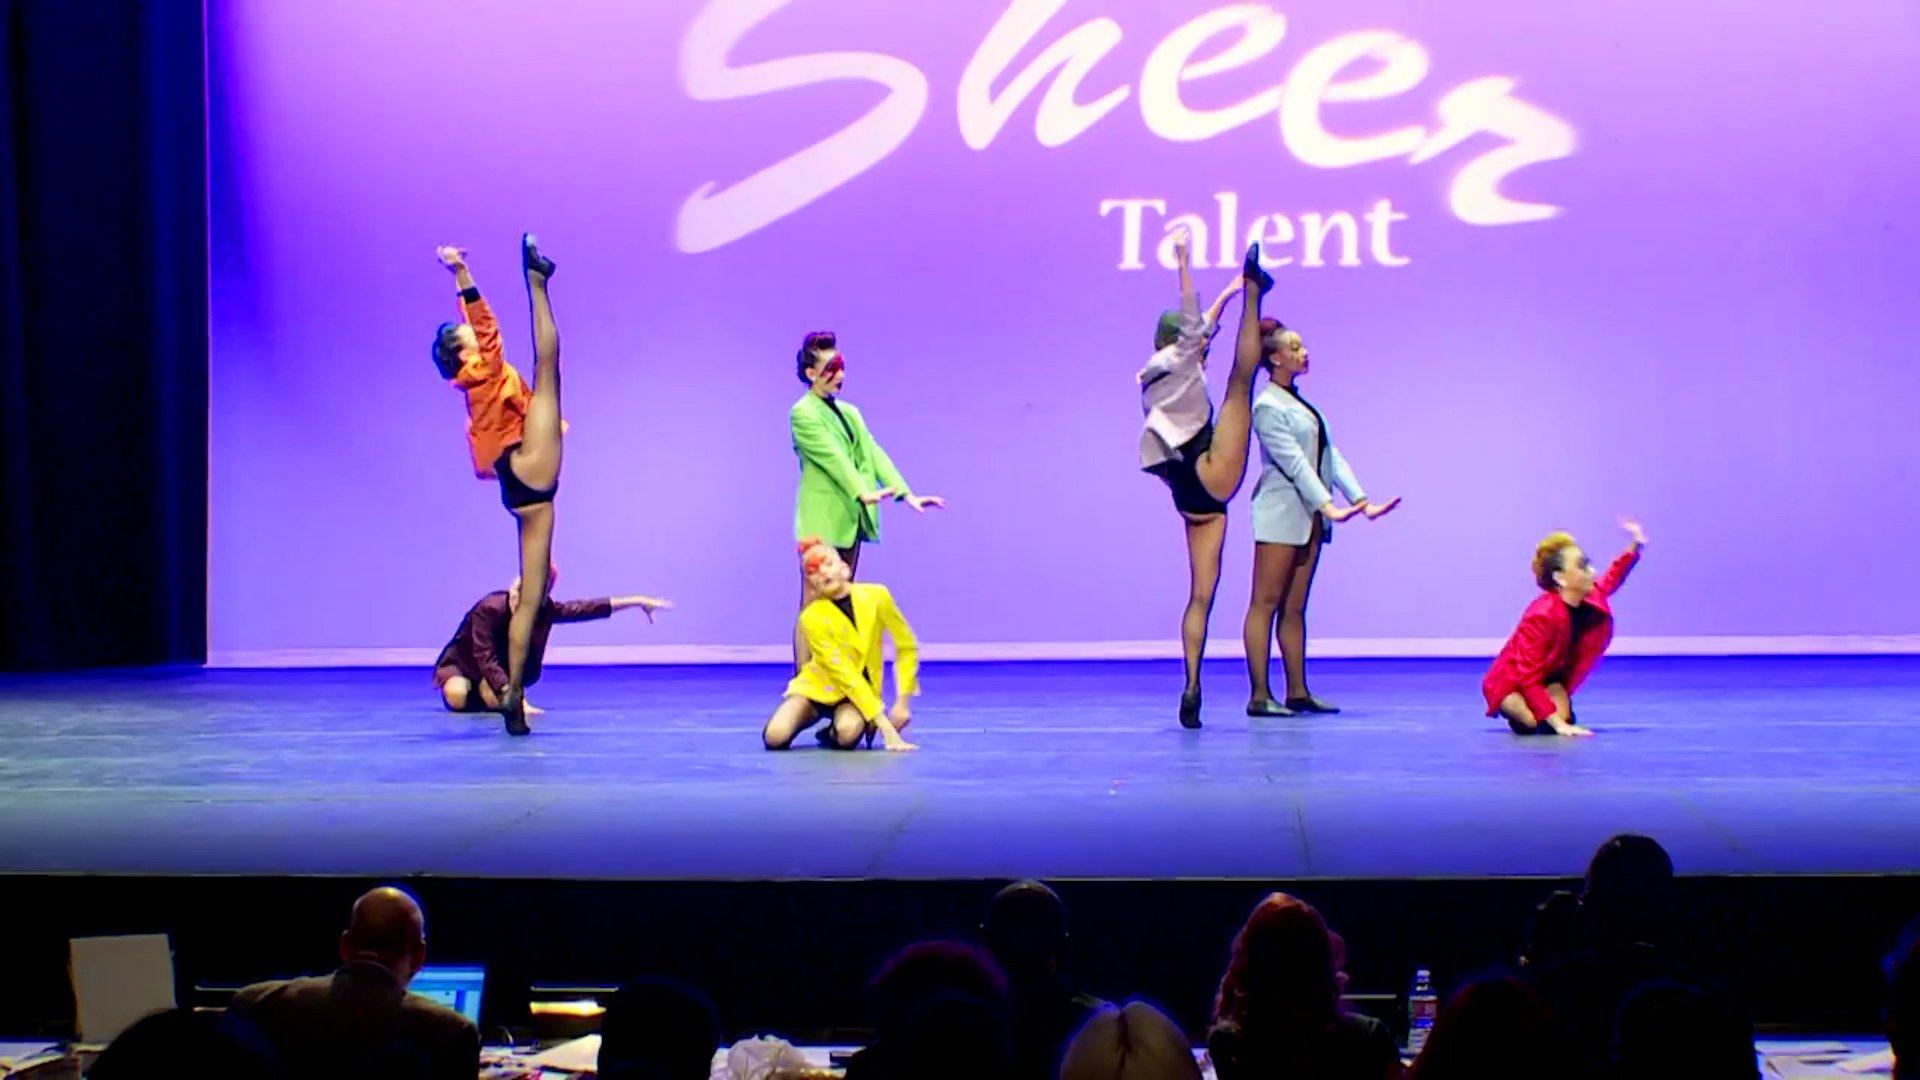 Maddie Ziegler, Mackenzie Ziegler, Nia Sioux, Kalani Hilliker, Kendall Vertes, JoJo Siwa, and Brynn Rumfallo in Dance Moms (2011)